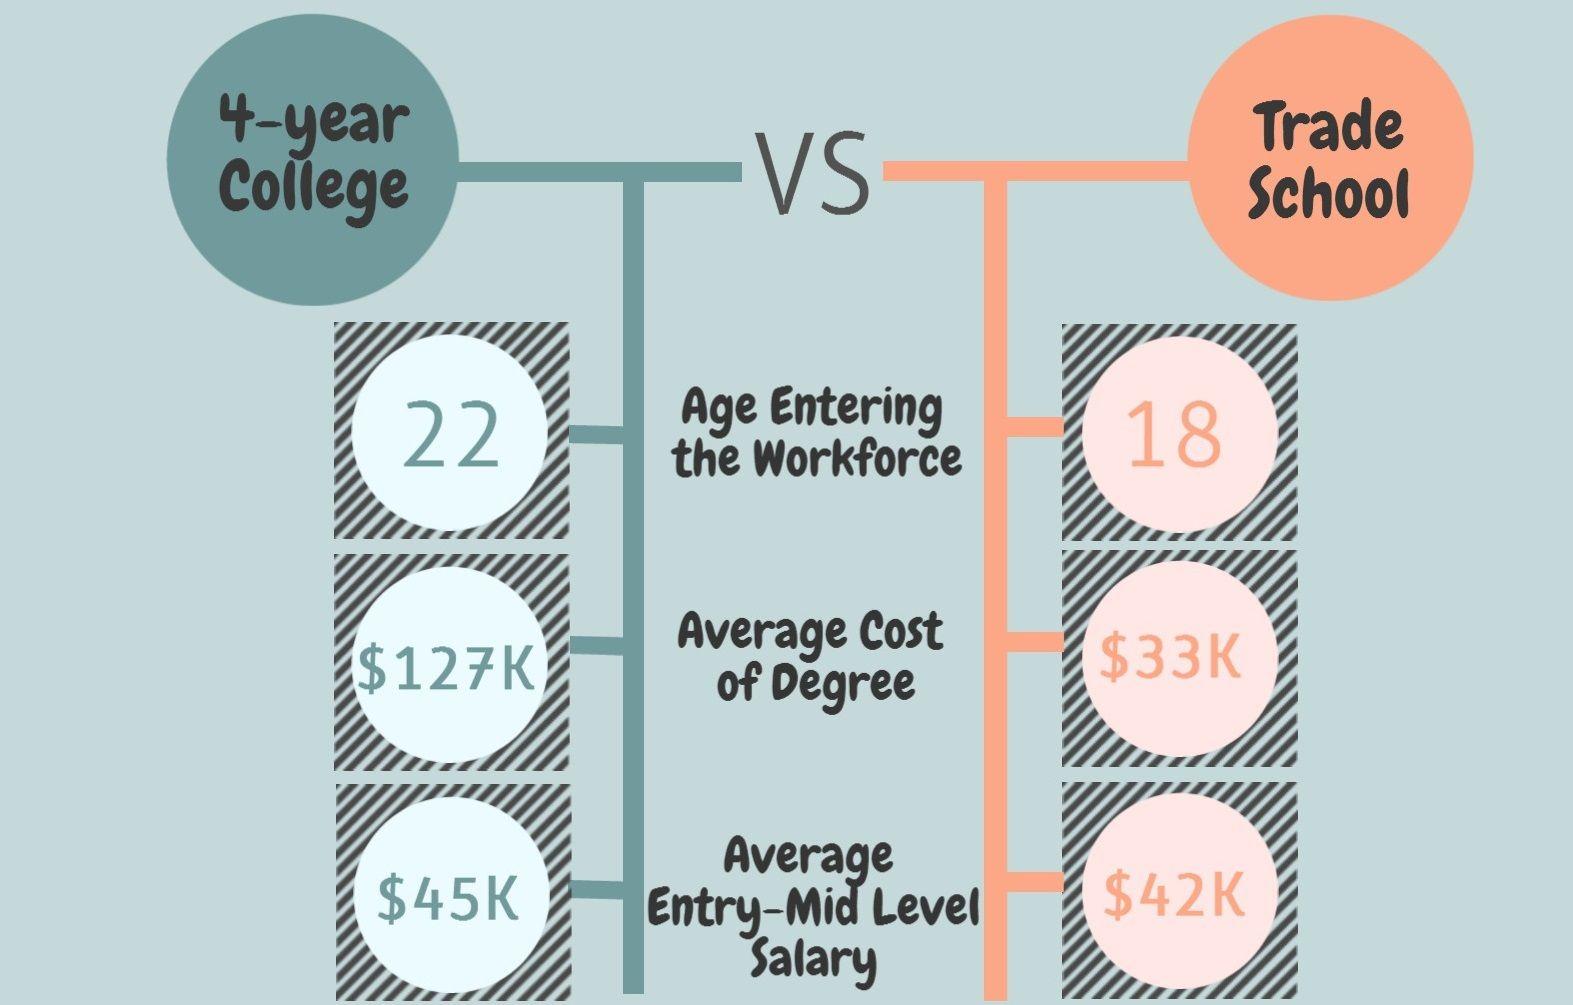 College Vs Trade School Infographic Tech school, Trade